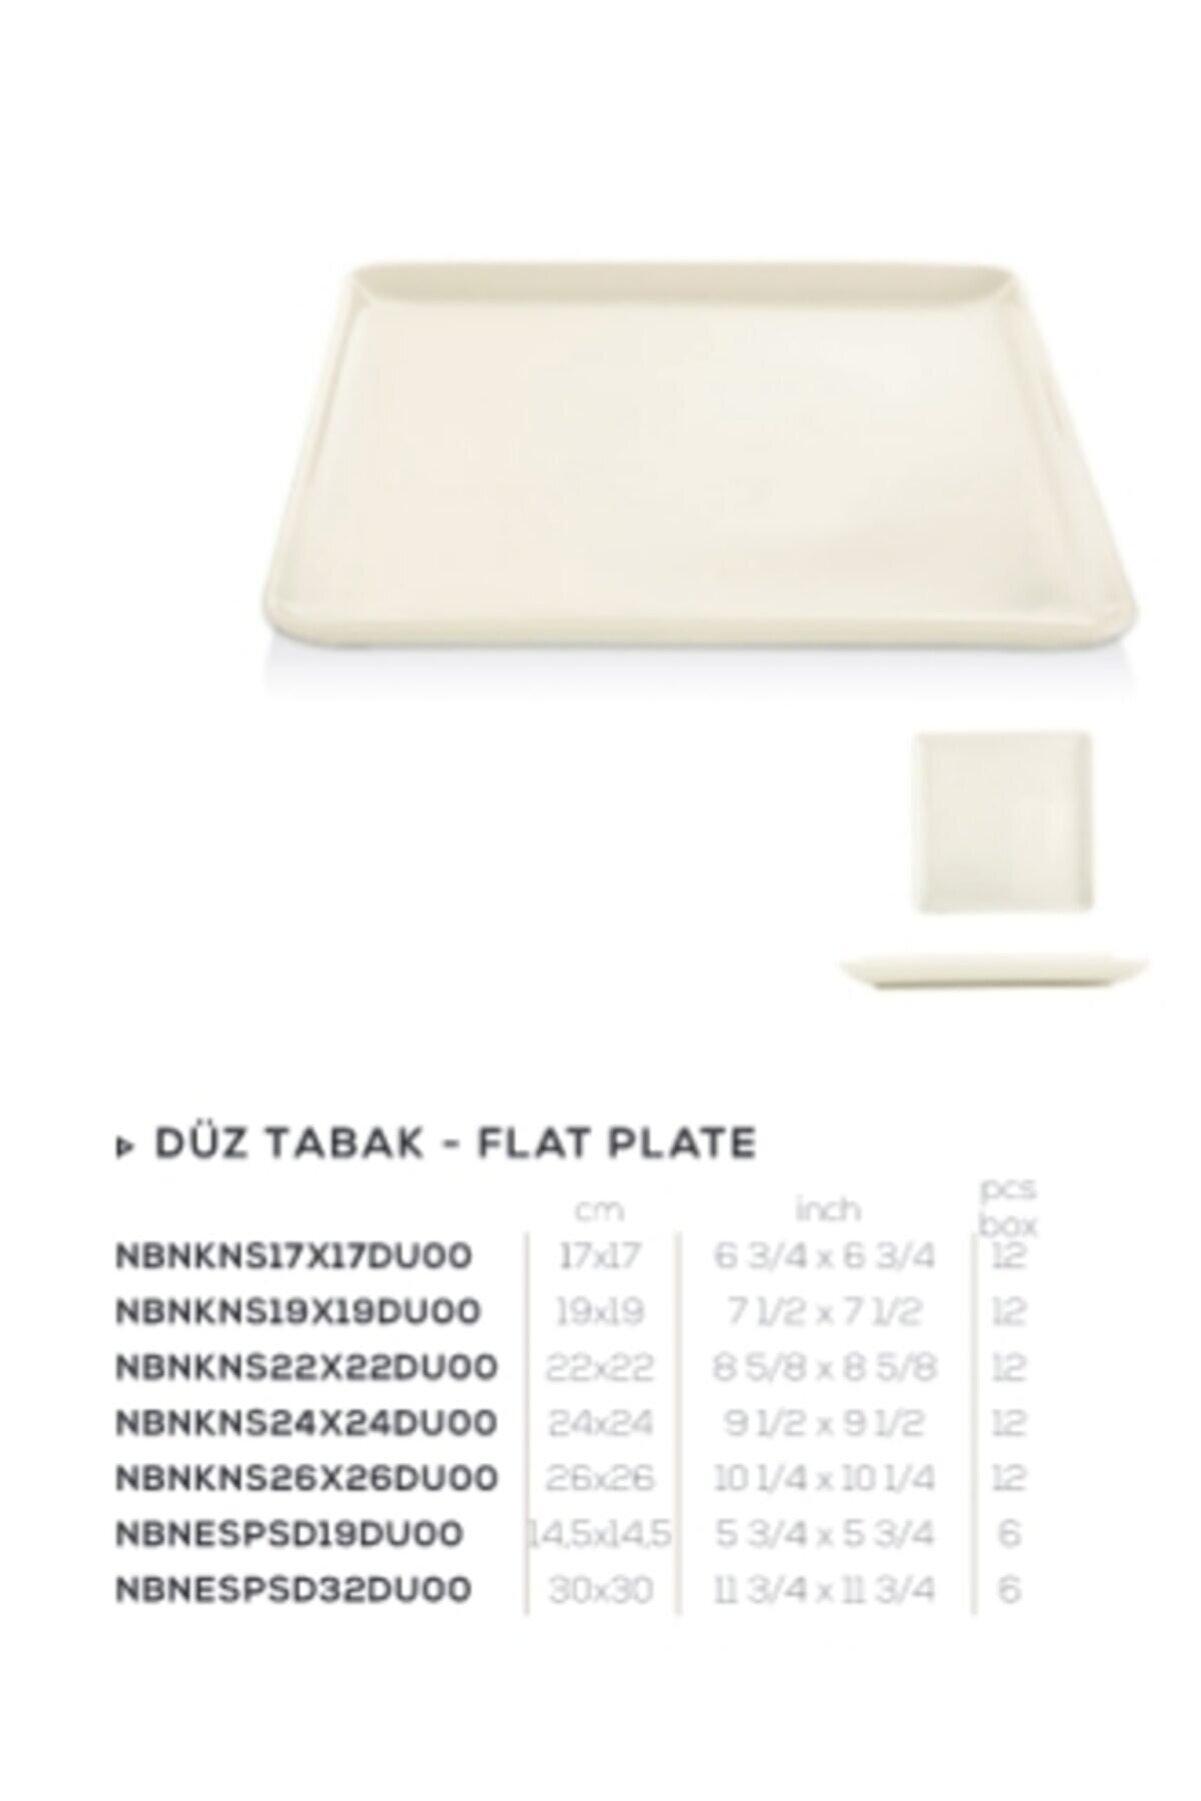 Güral Porselen Gbs Bone Kansas 26x26cm.duz Tabak Gbskns26x26du00